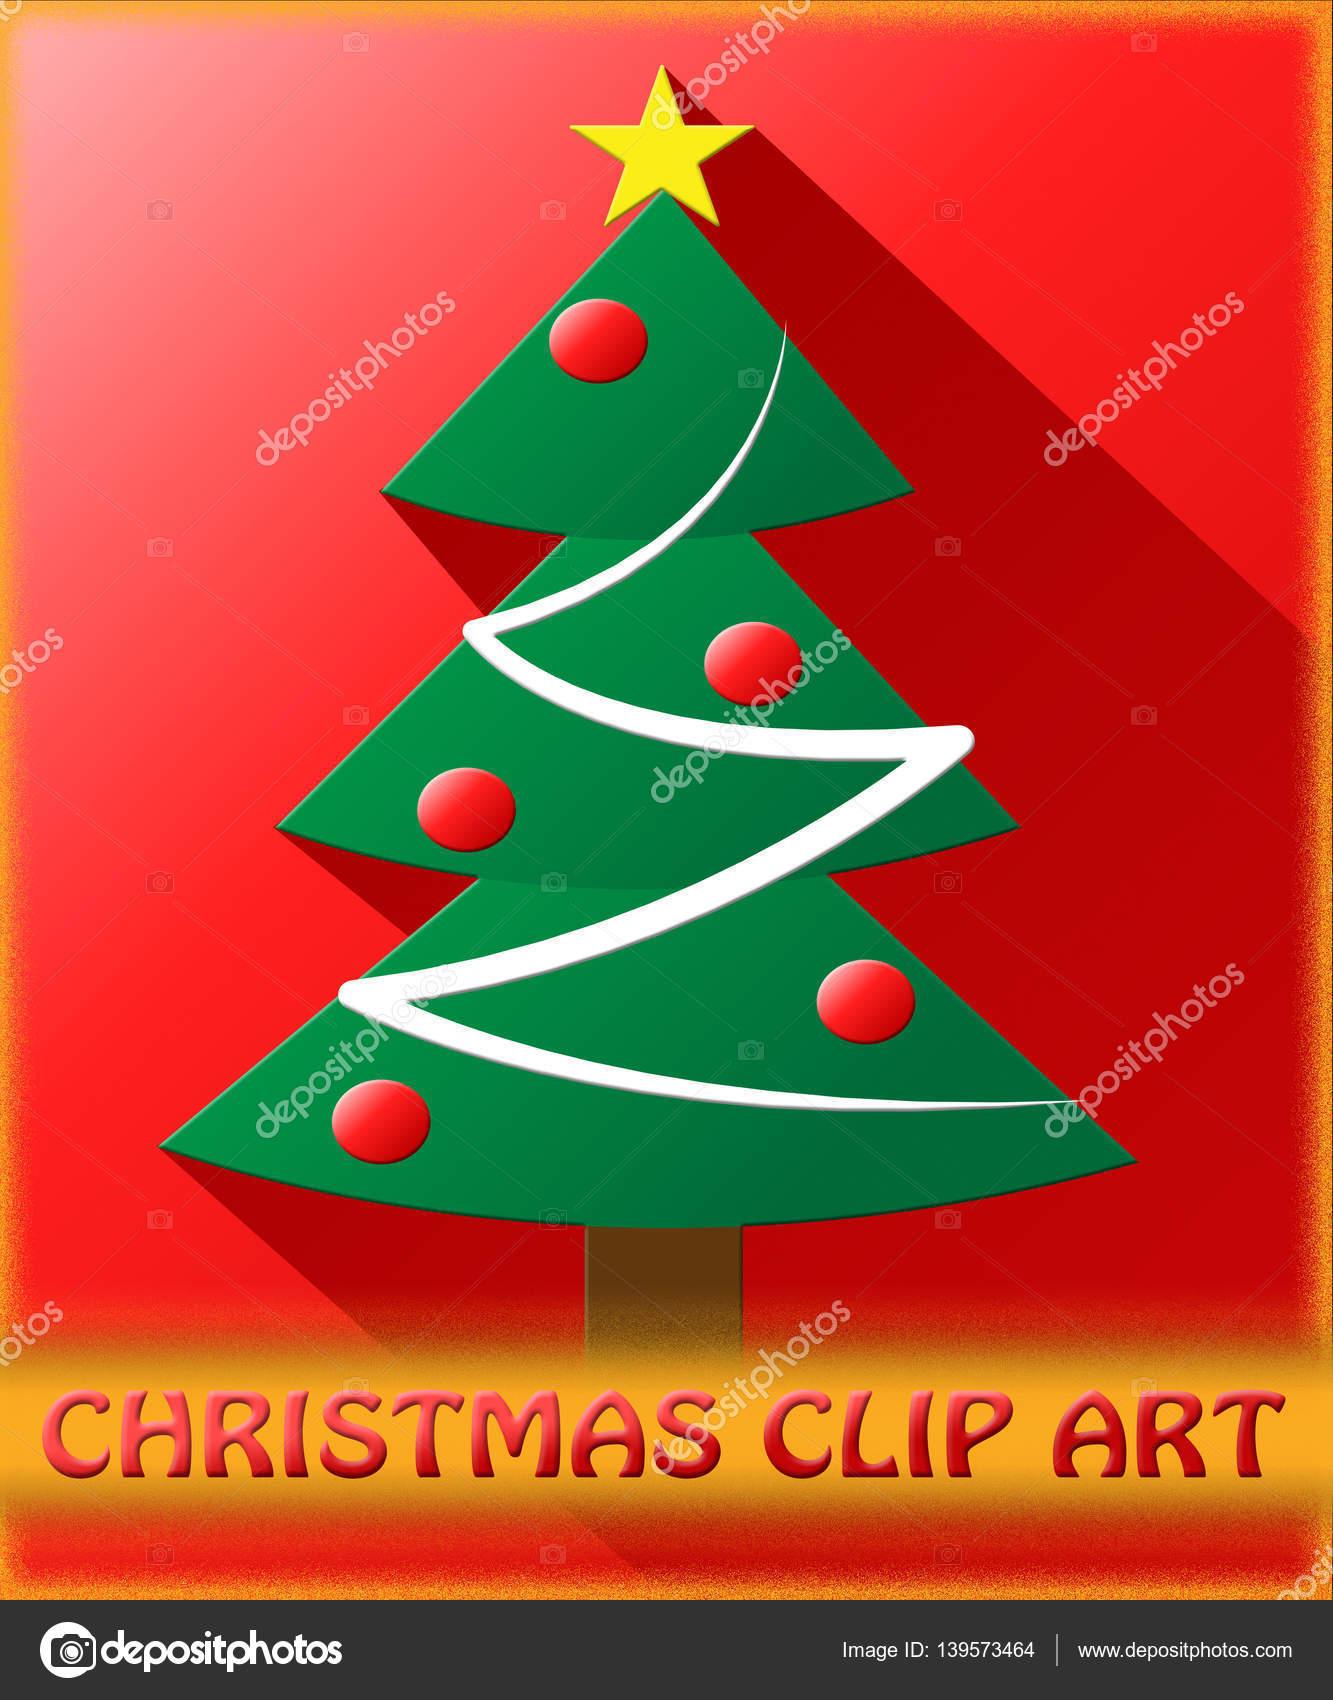 Weihnachten ClipArt Clipart 3d Illustration Bedeutung — Stockfoto ...